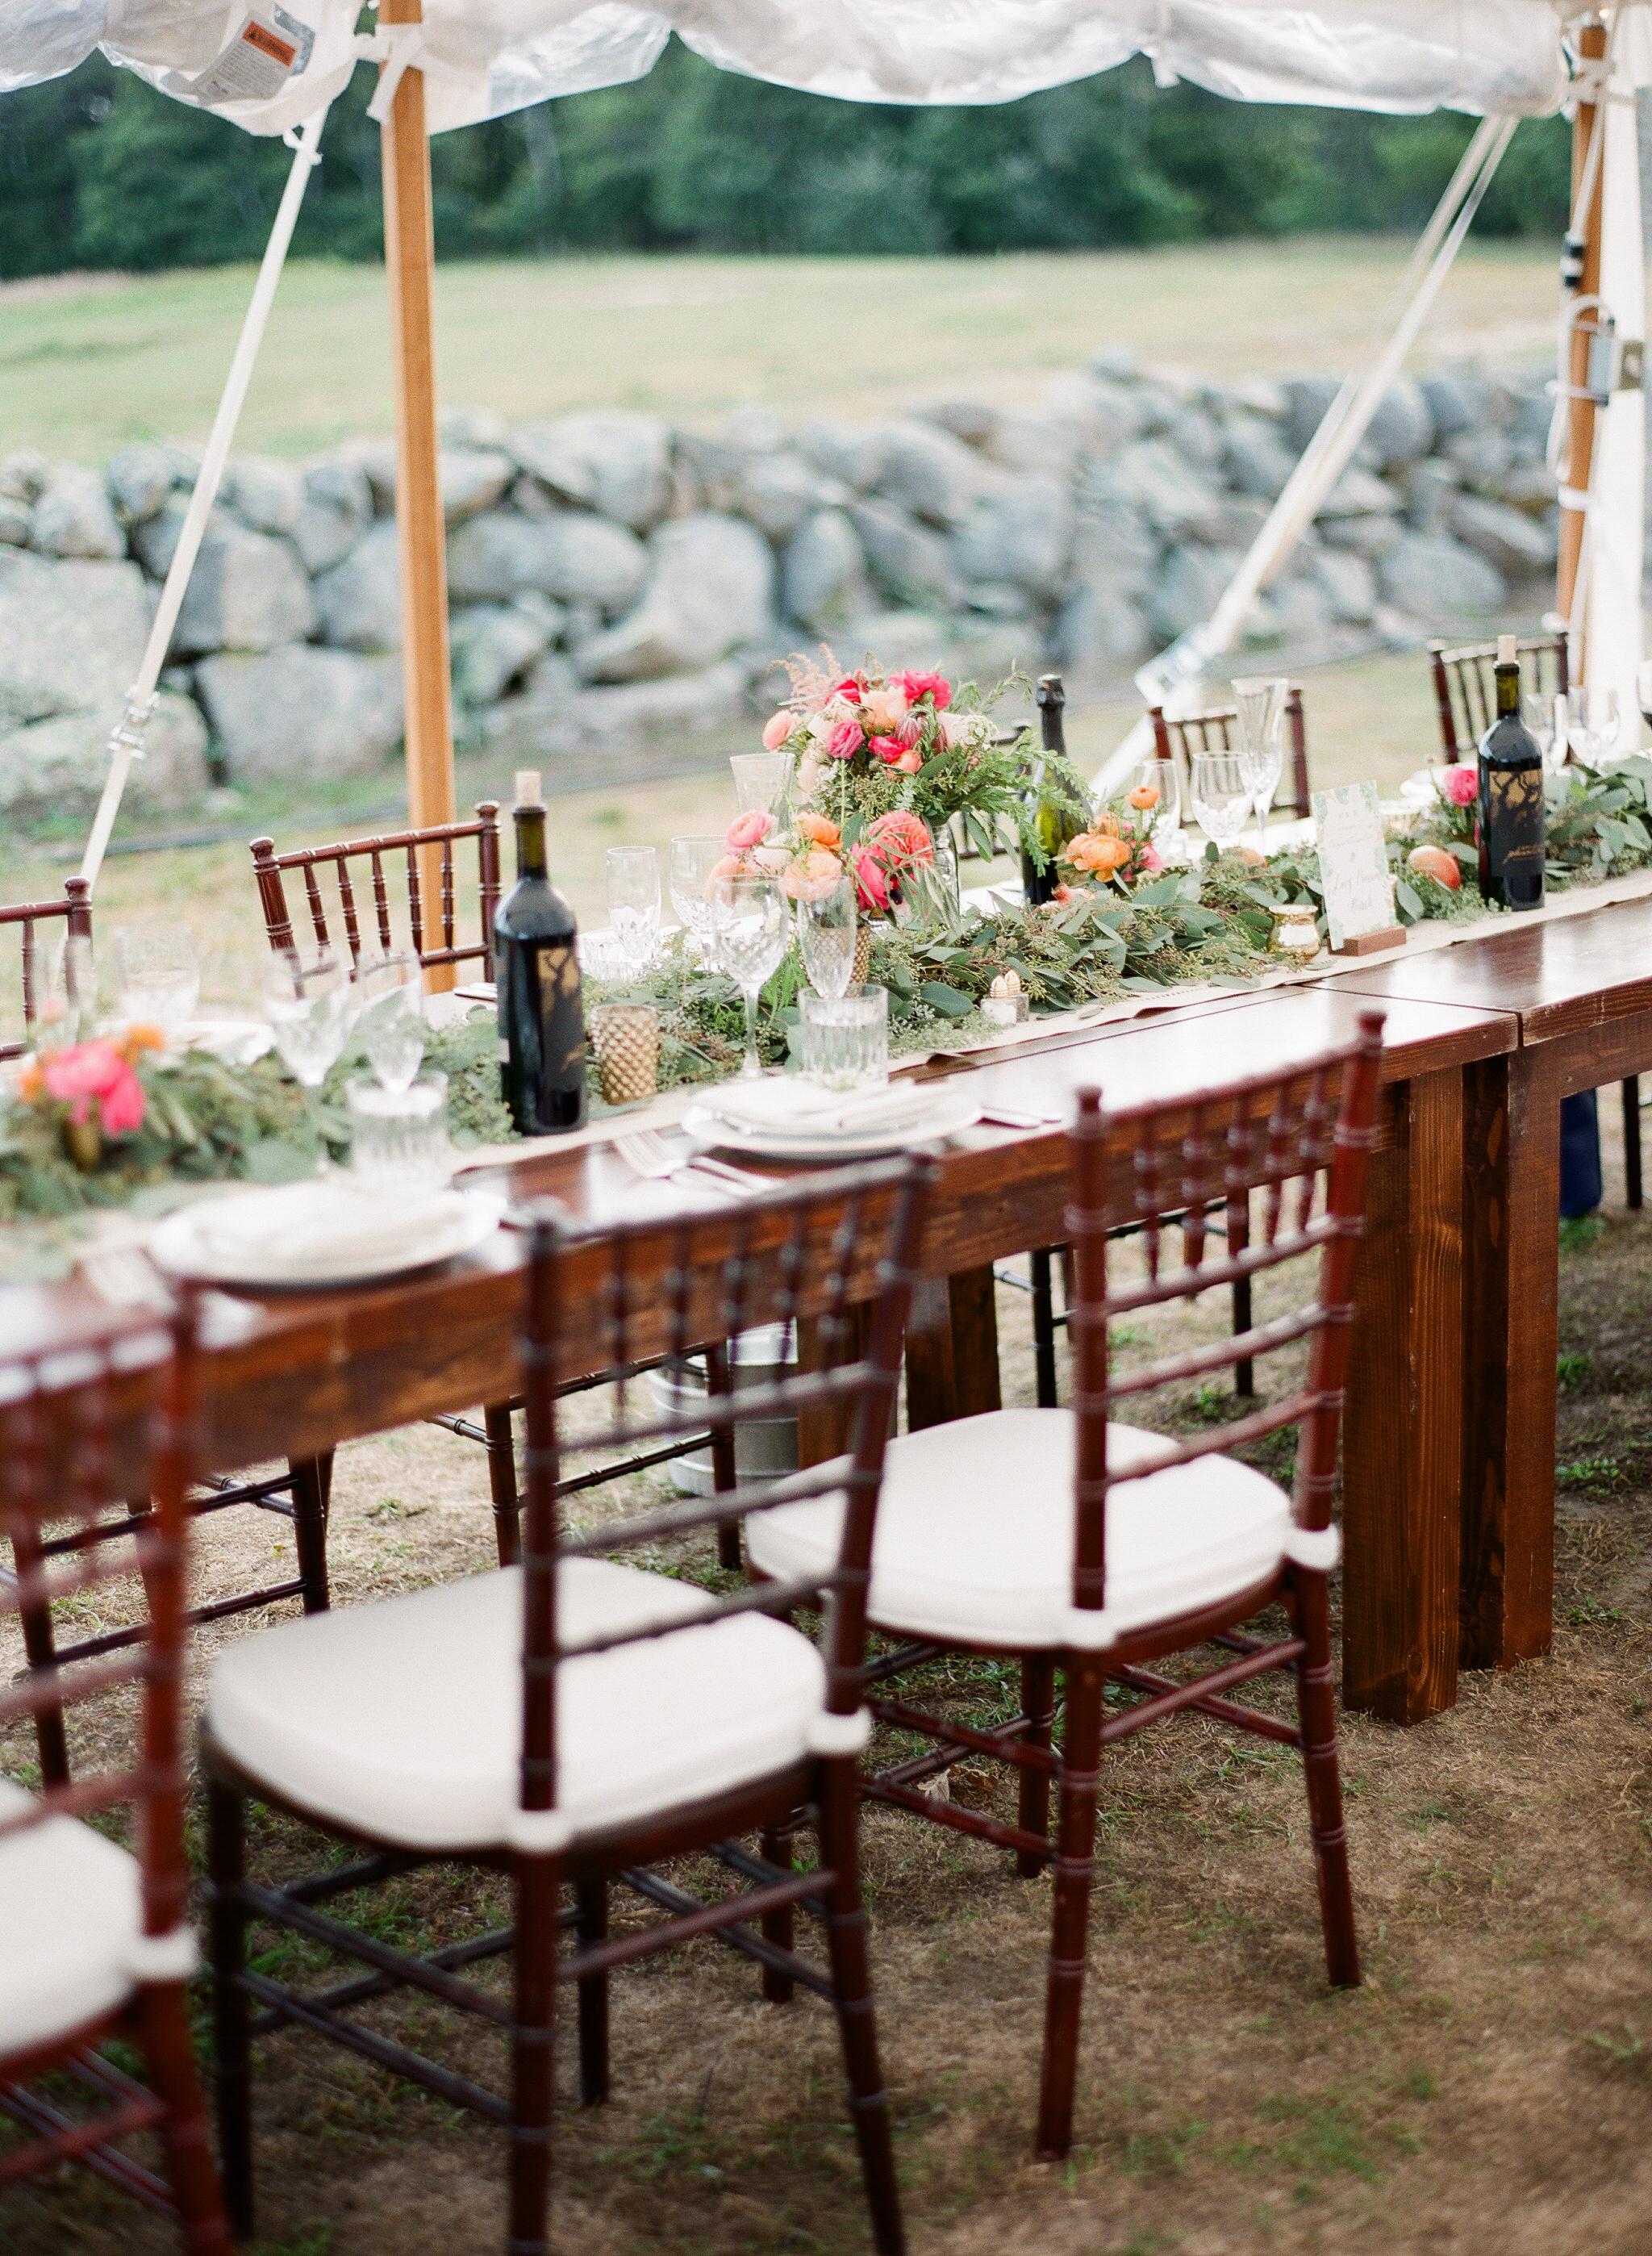 michellebeller.com | Michelle Beller Photography | Martha's Vineyard Wedding | Destination Wedding Photographer | Massachusetts Wedding Planning